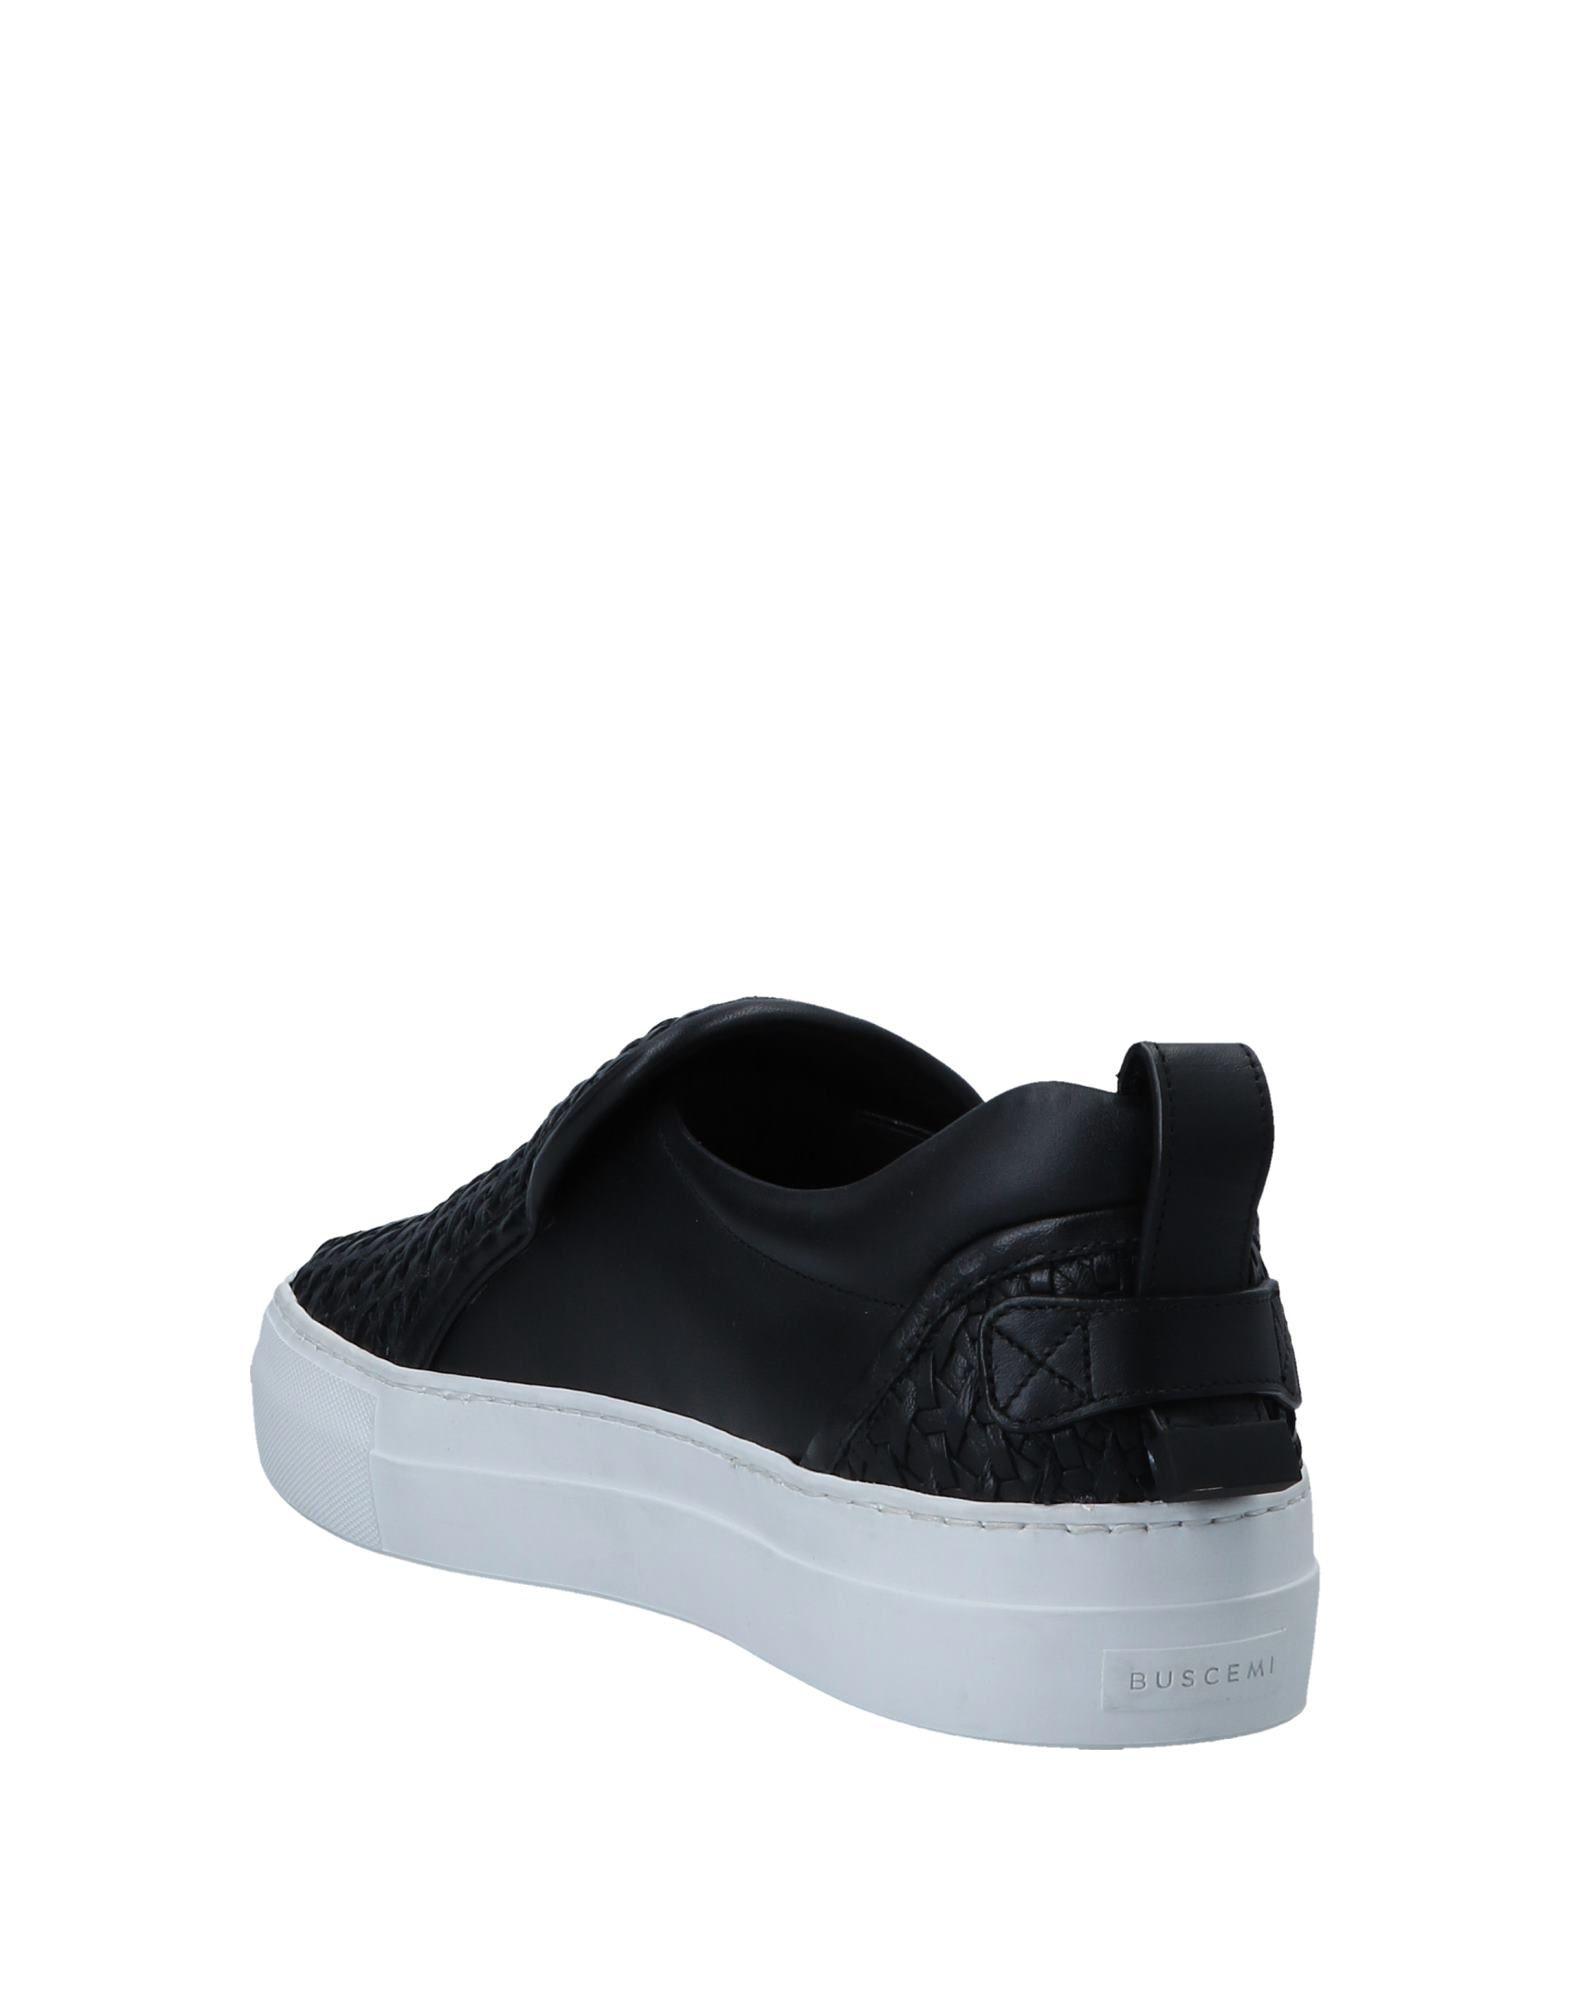 Buscemi Damen Turnschuhes Damen Buscemi 11558451ODGünstige gut aussehende Schuhe 33a4cd